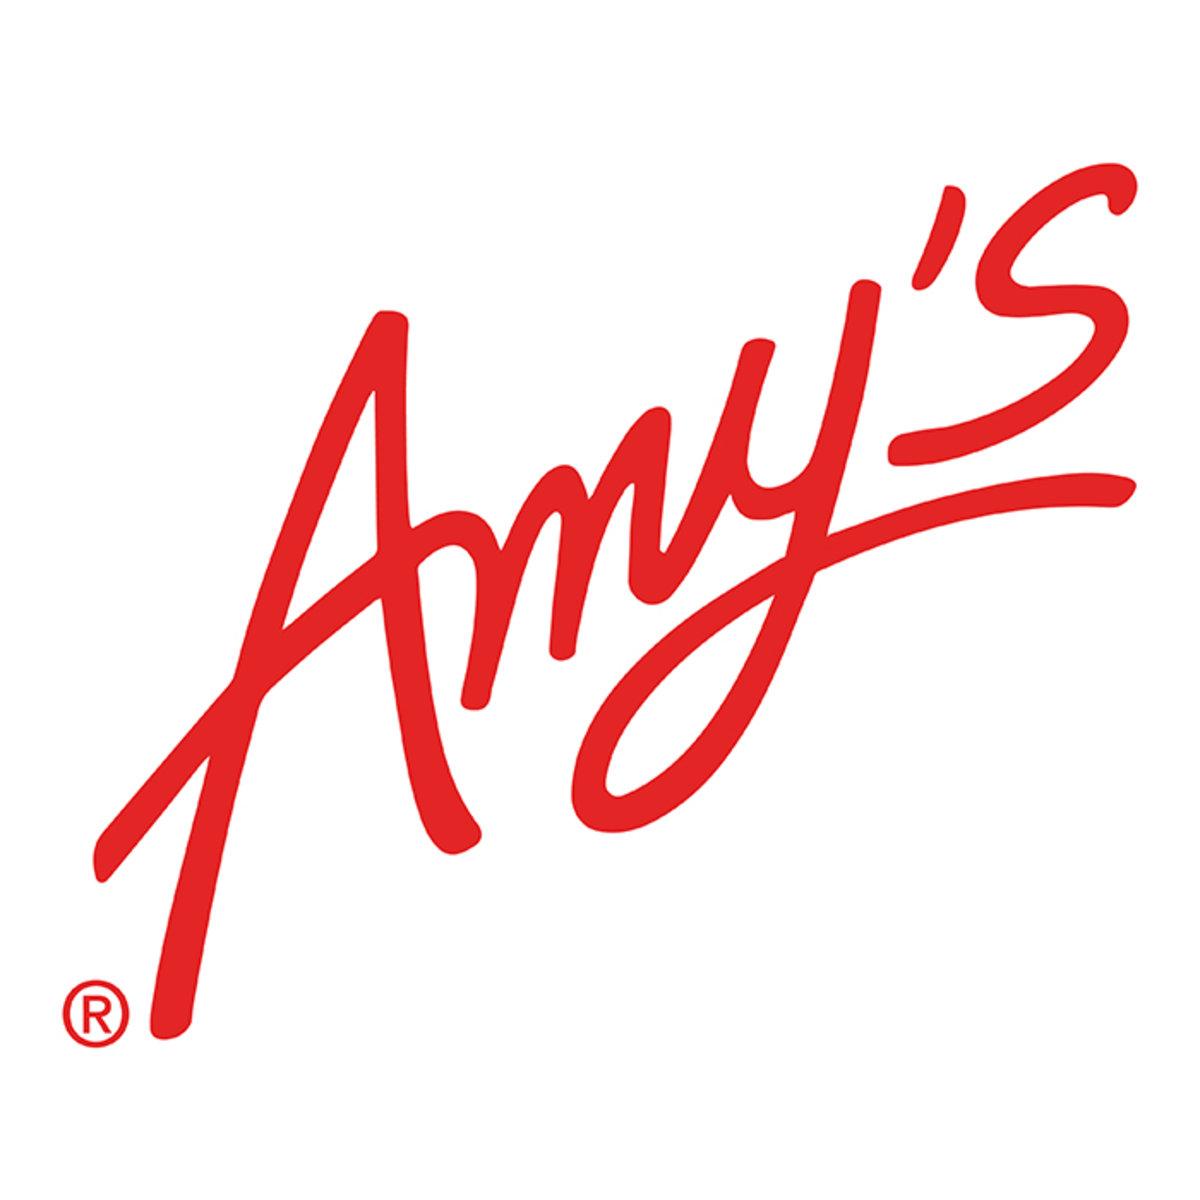 amys-logo-1.jpg